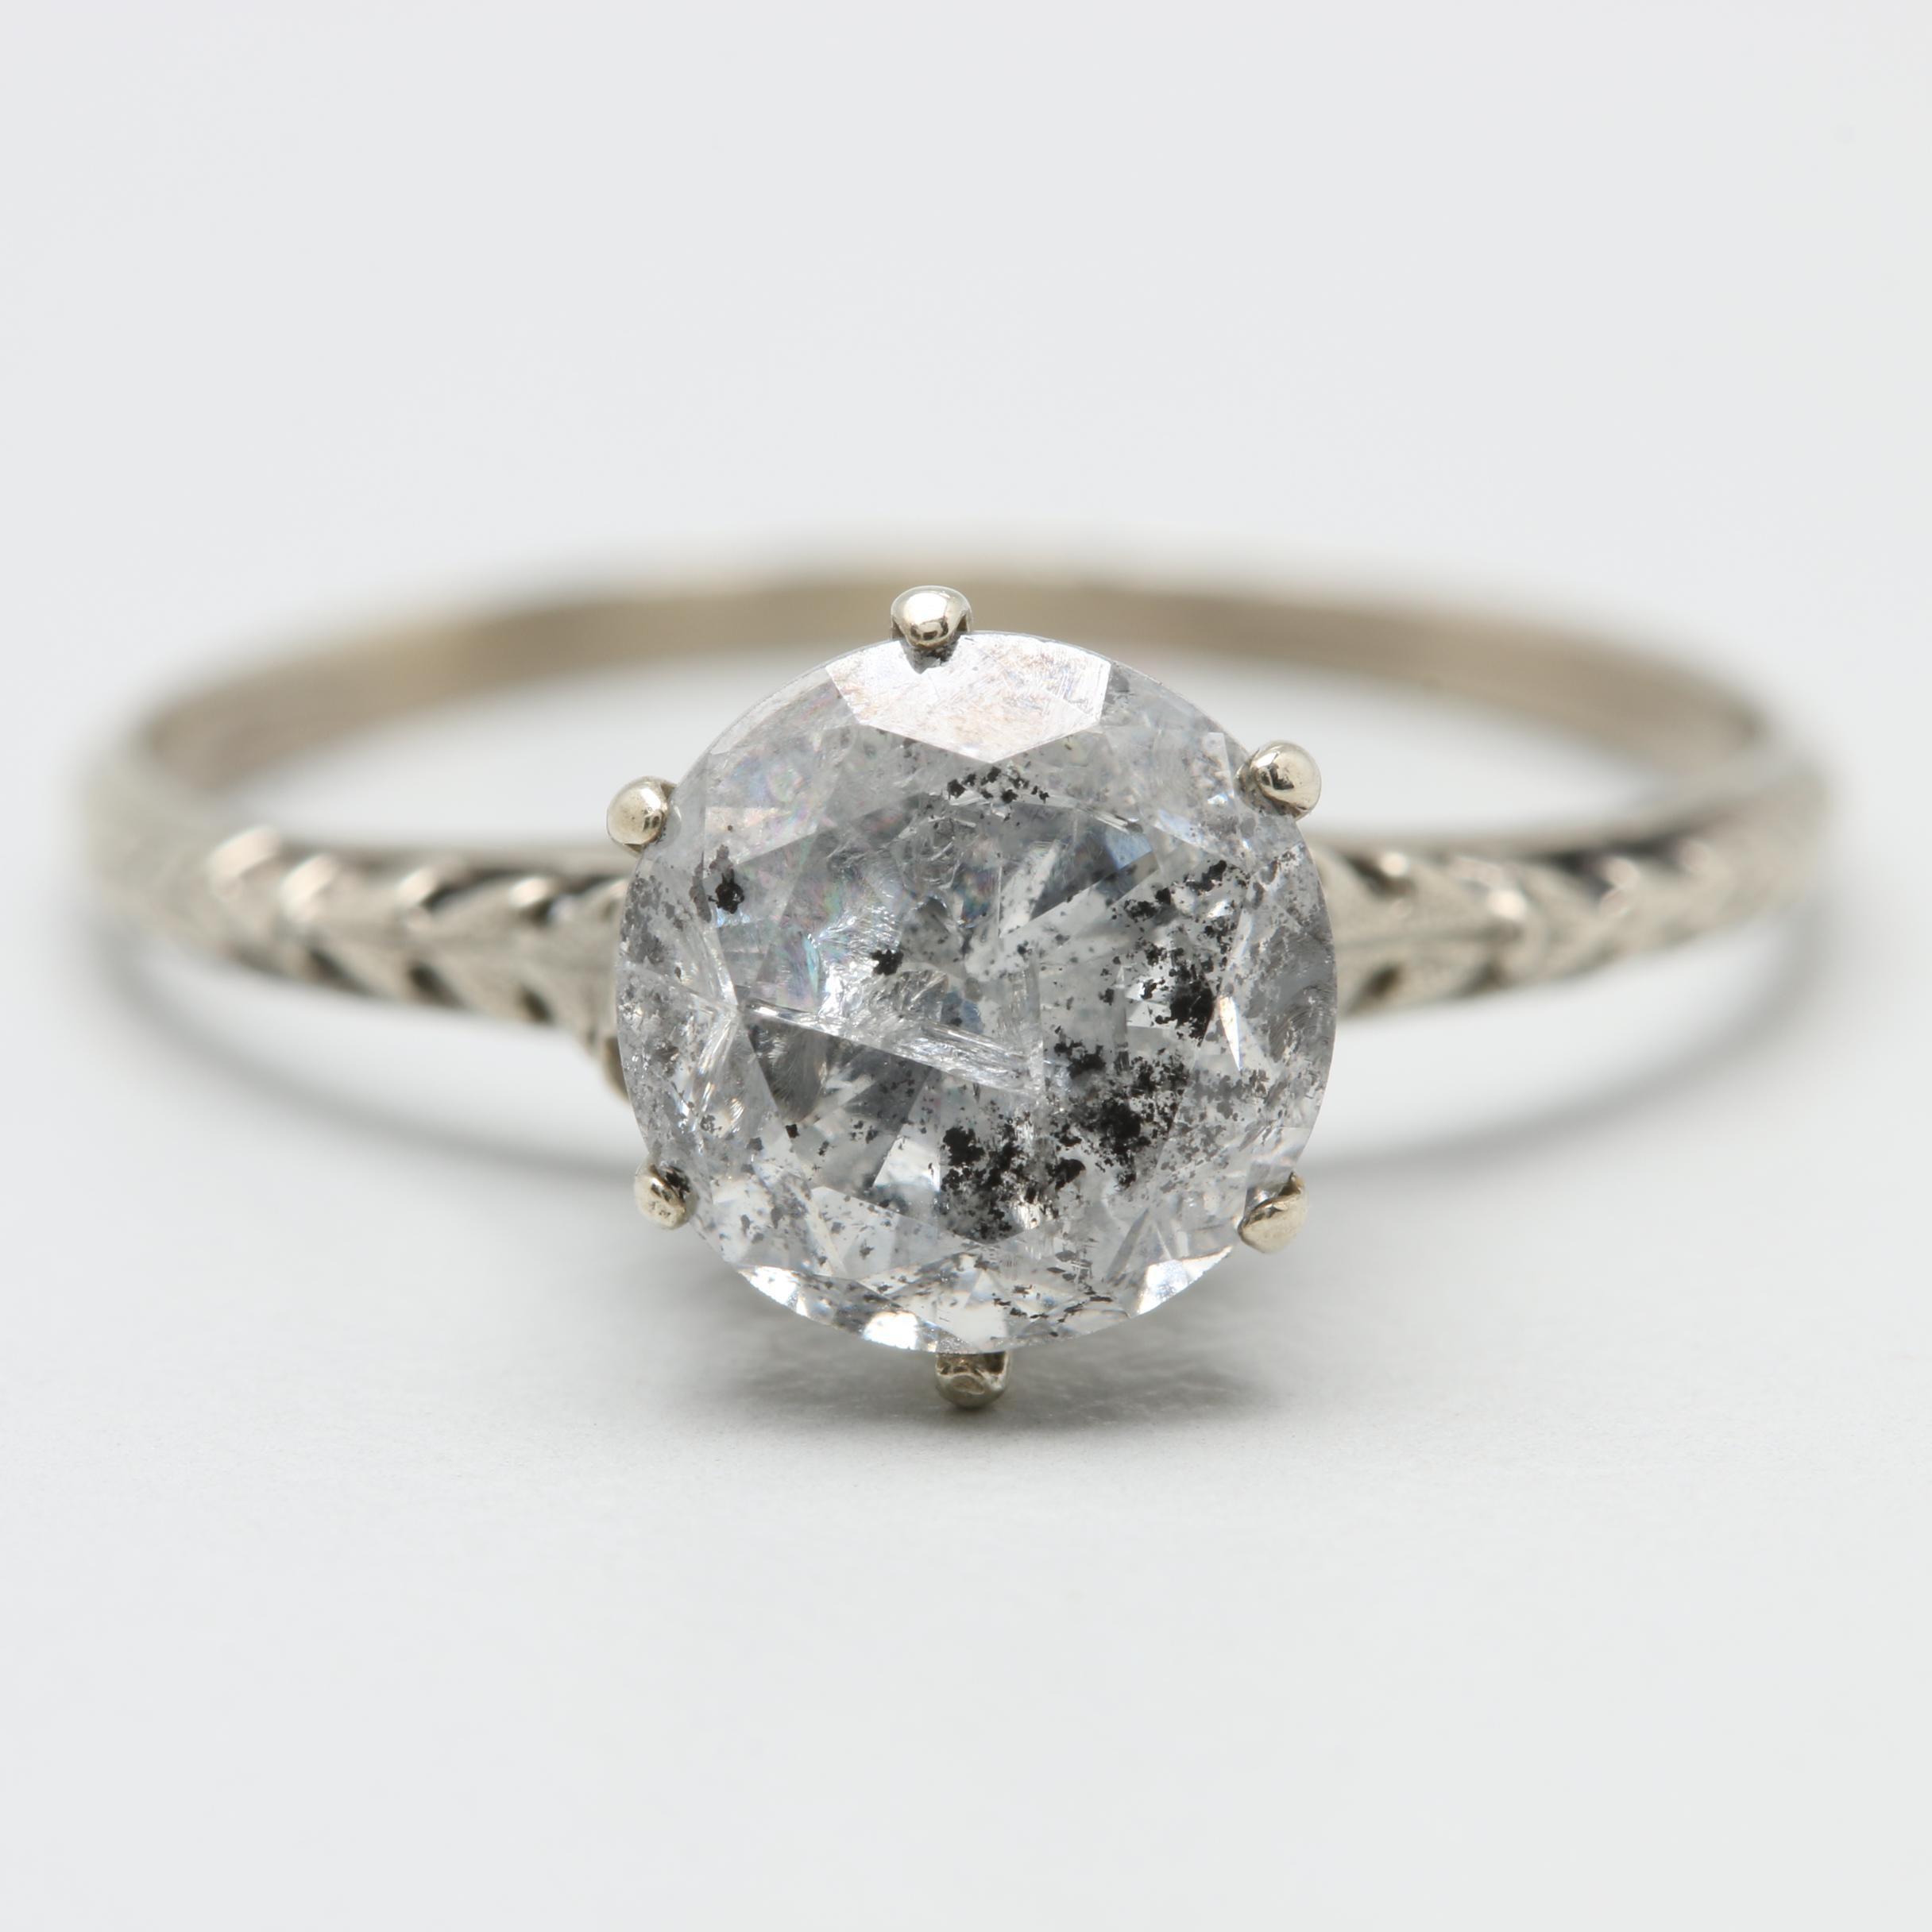 Edwardian 10K White Gold 1.34 CTW Diamond Ring